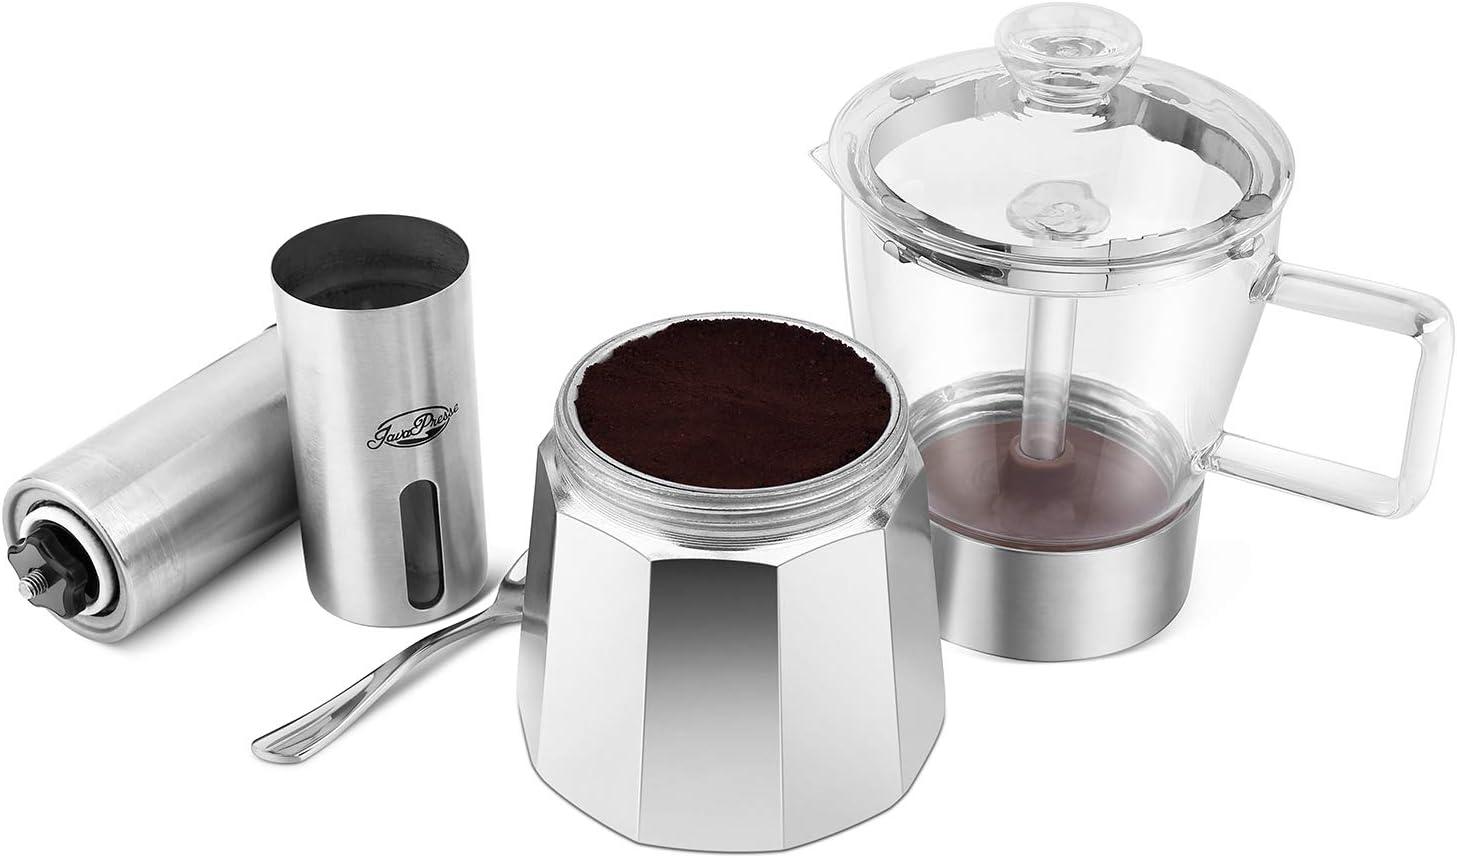 GEESTA Premium Crystal Glass-Top Stovetop Espresso Moka Pot - 6 cup - Coffee Maker